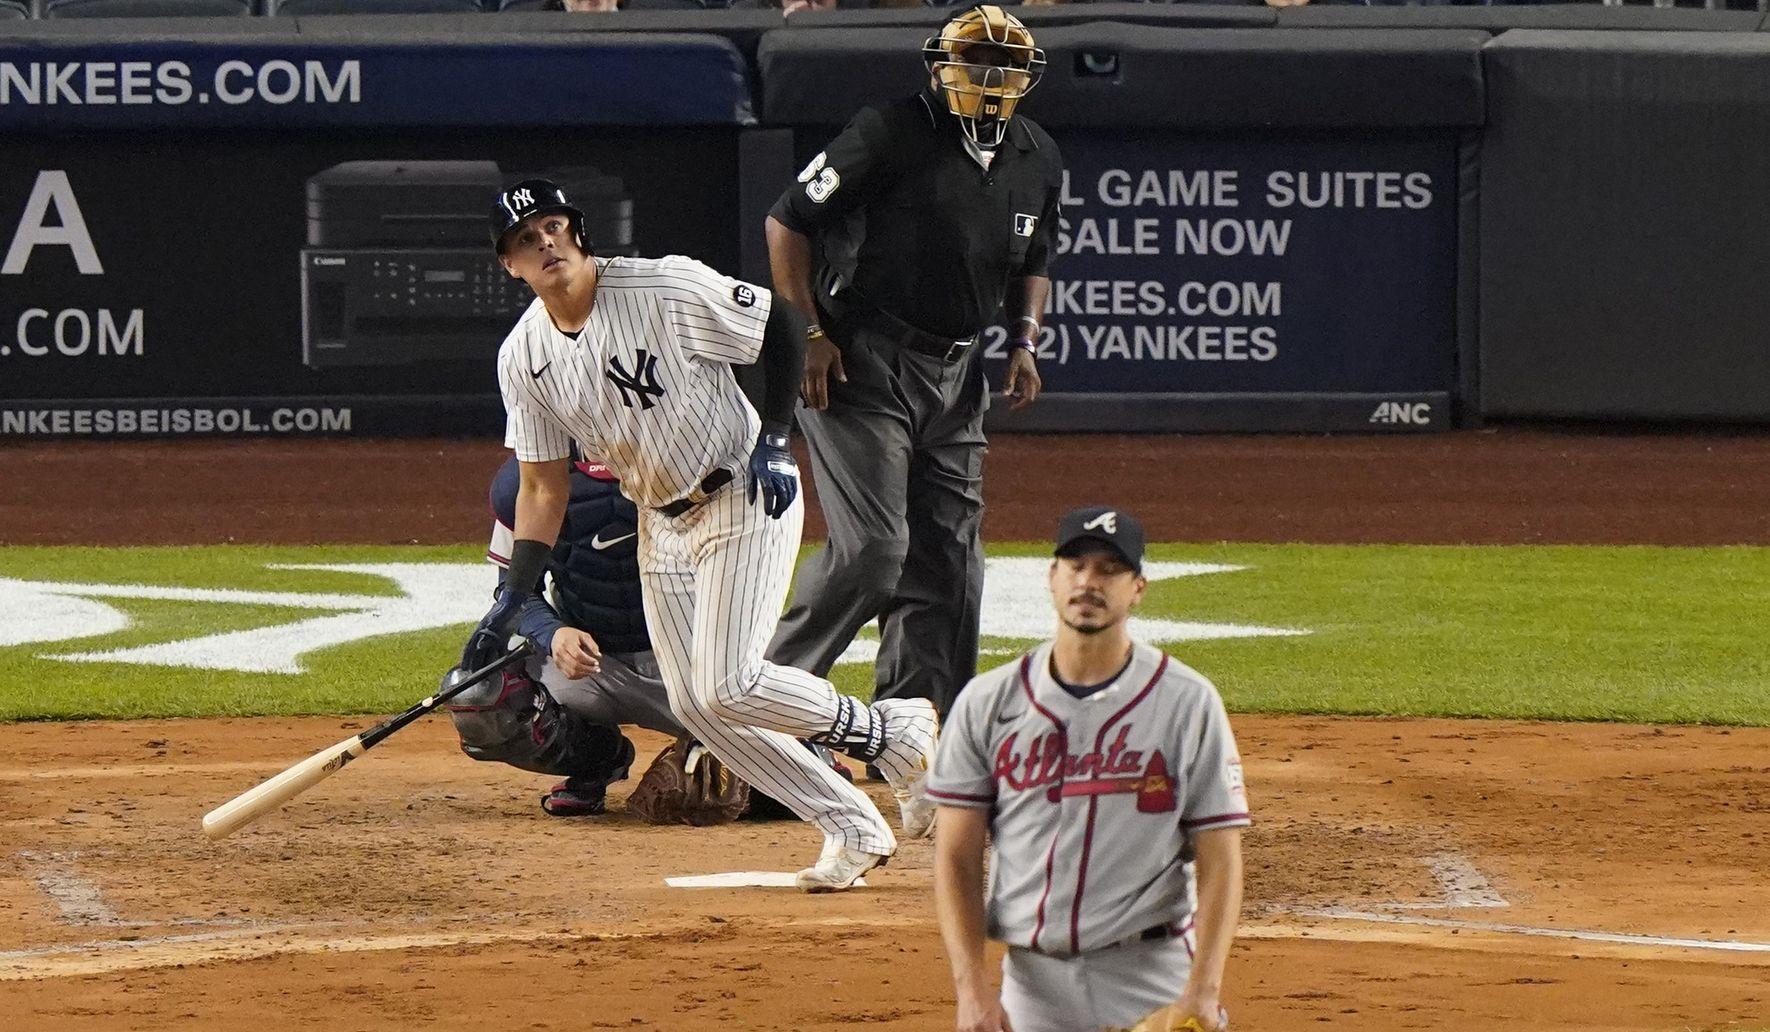 Braves_yankees_baseball_66299_c0-114-2711-1694_s1770x1032